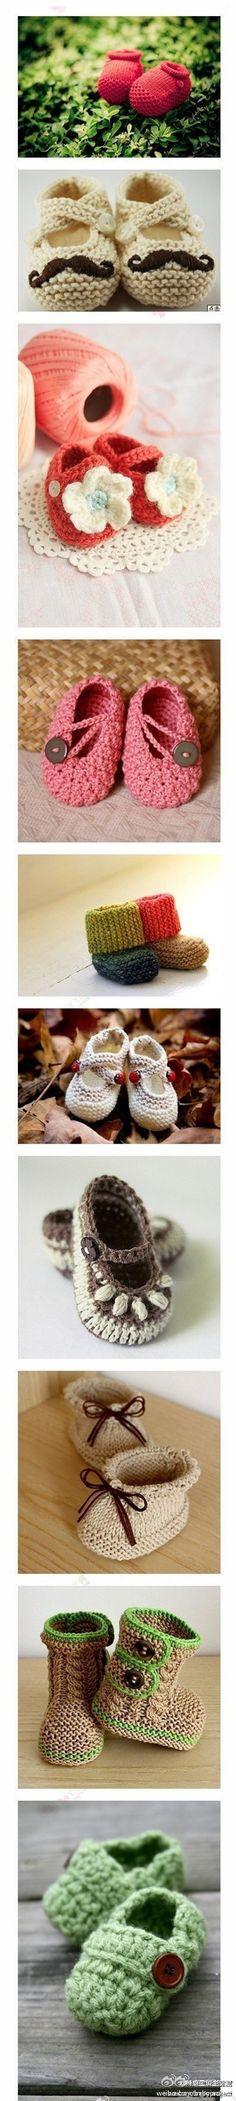 cute crotchet baby shoes